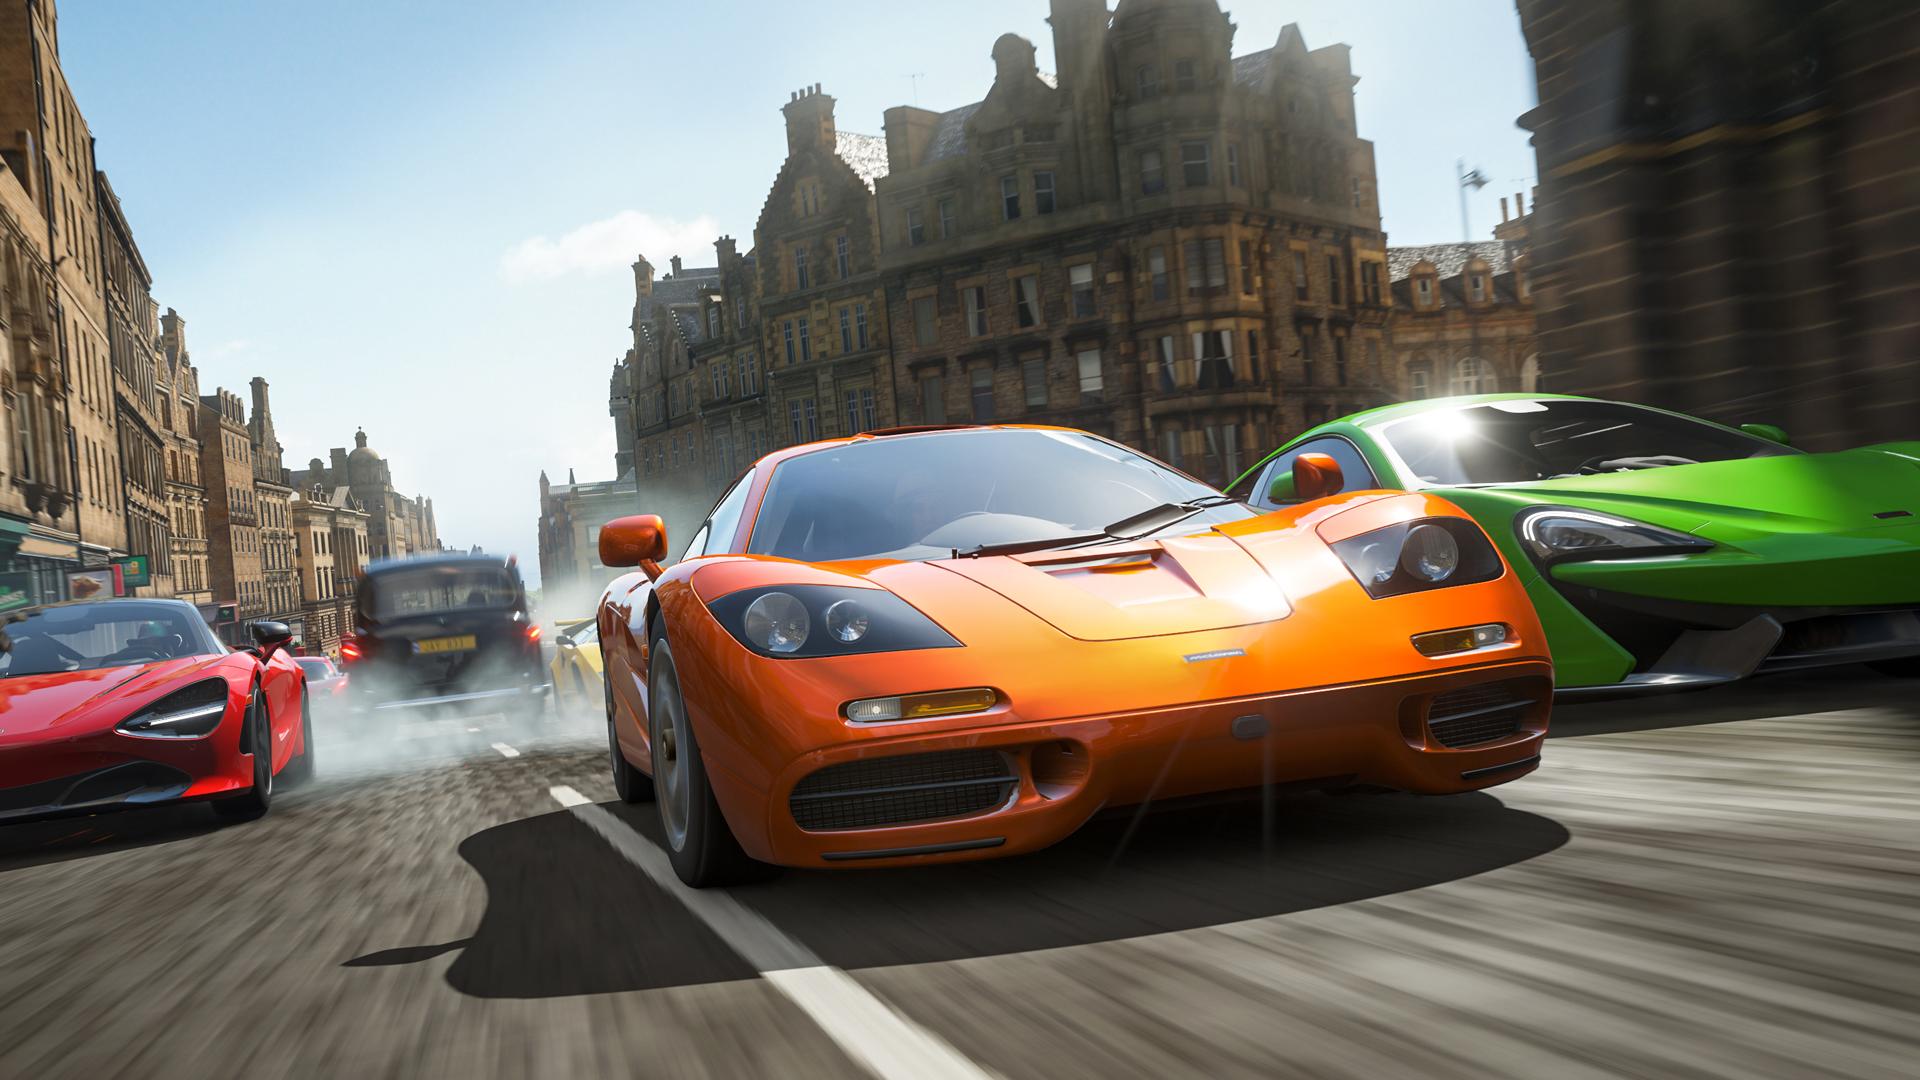 Forza Horizon 4 PC review | PCGamesN